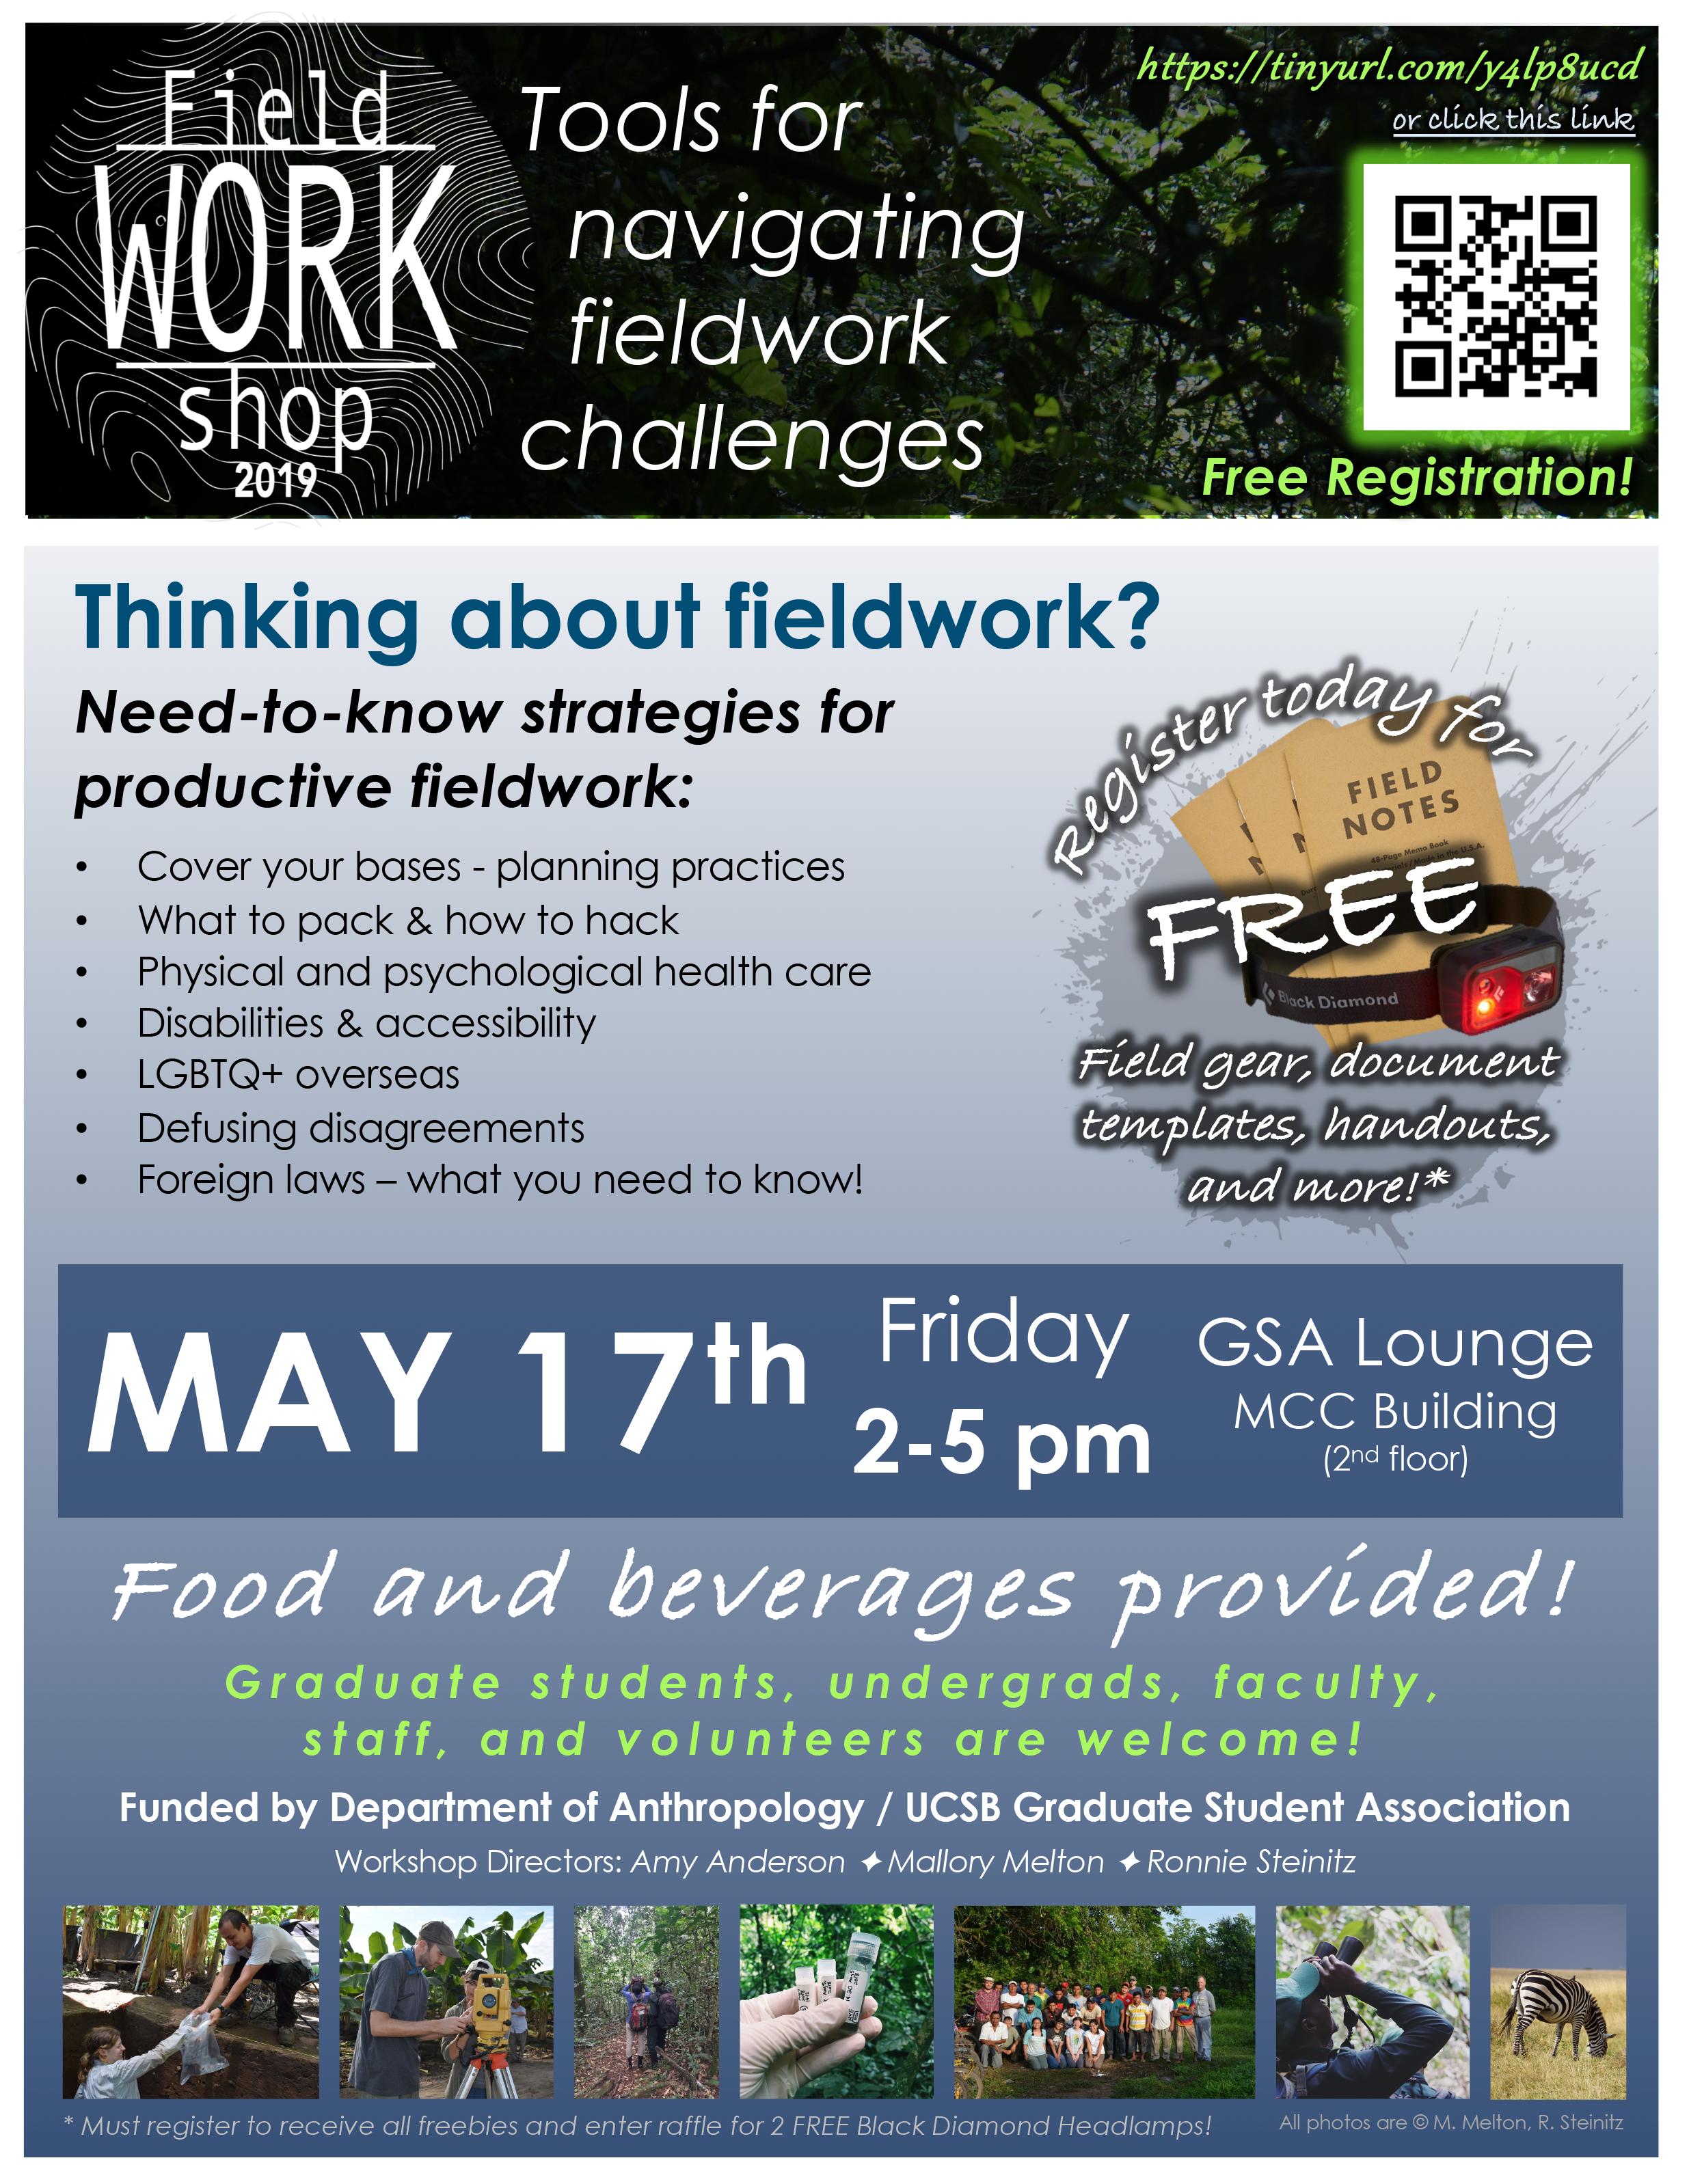 FieldWORKshop2019fbgroup.png